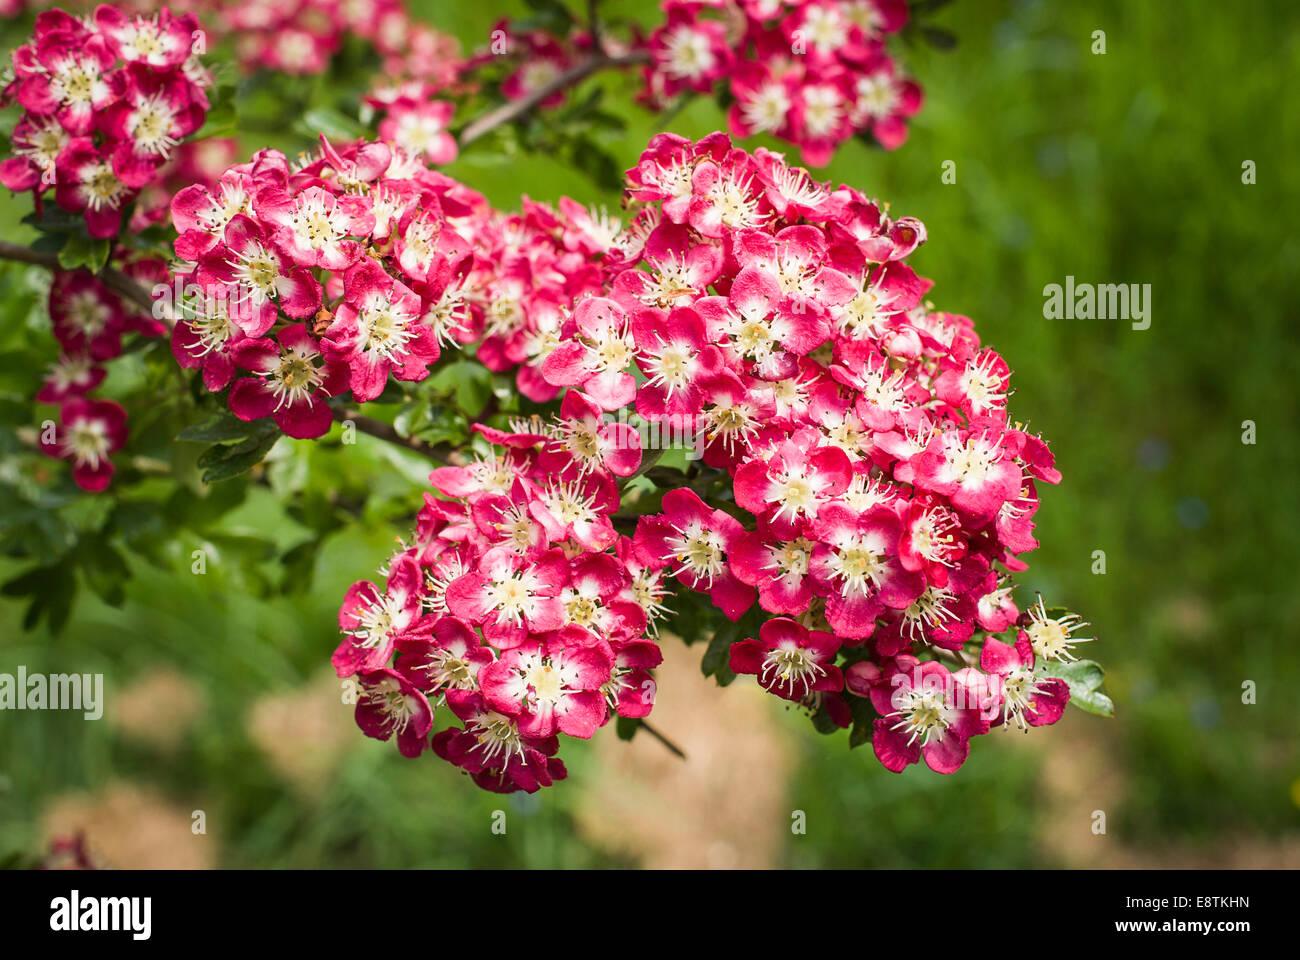 Flowering blossom on an ornamental hawthorn tree - Stock Image